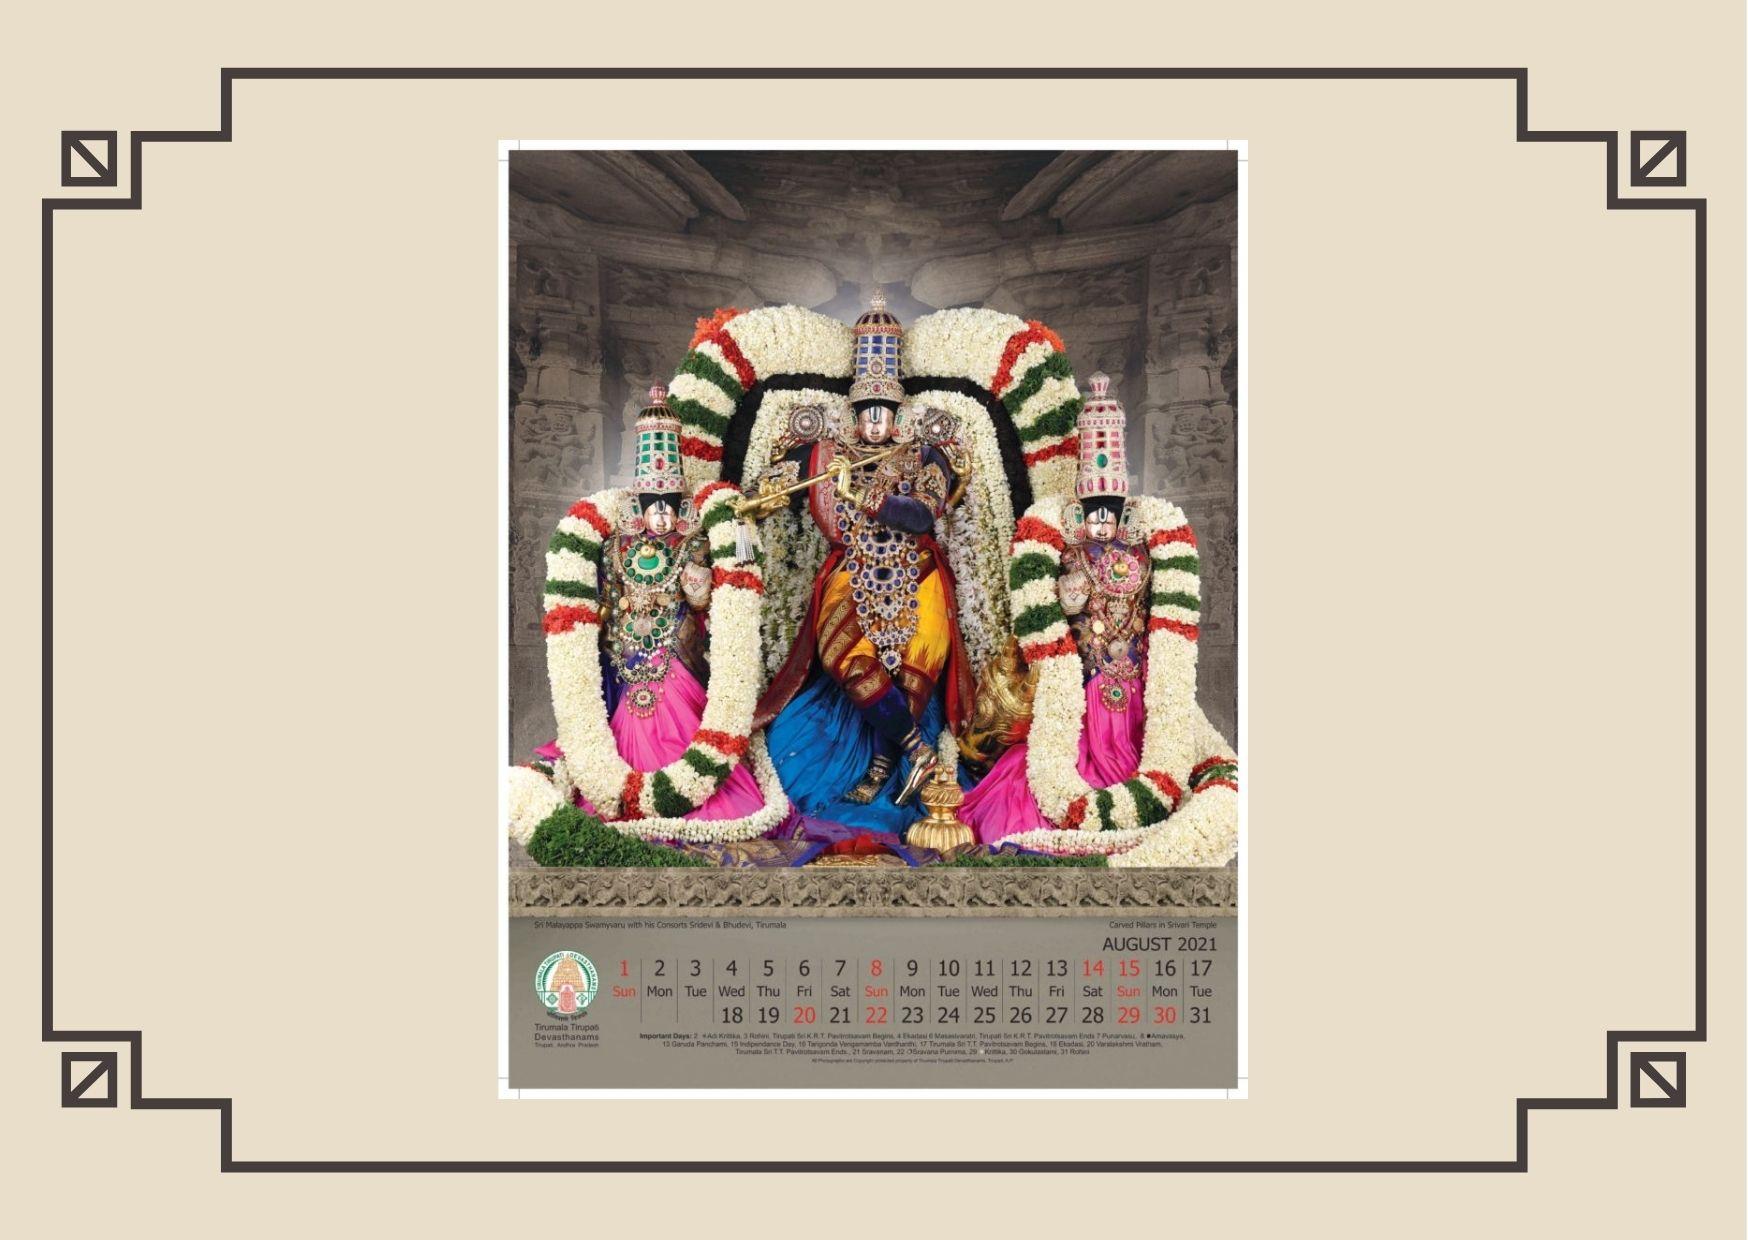 TTD Calendar 2021 PDF Download Online tirumala.org